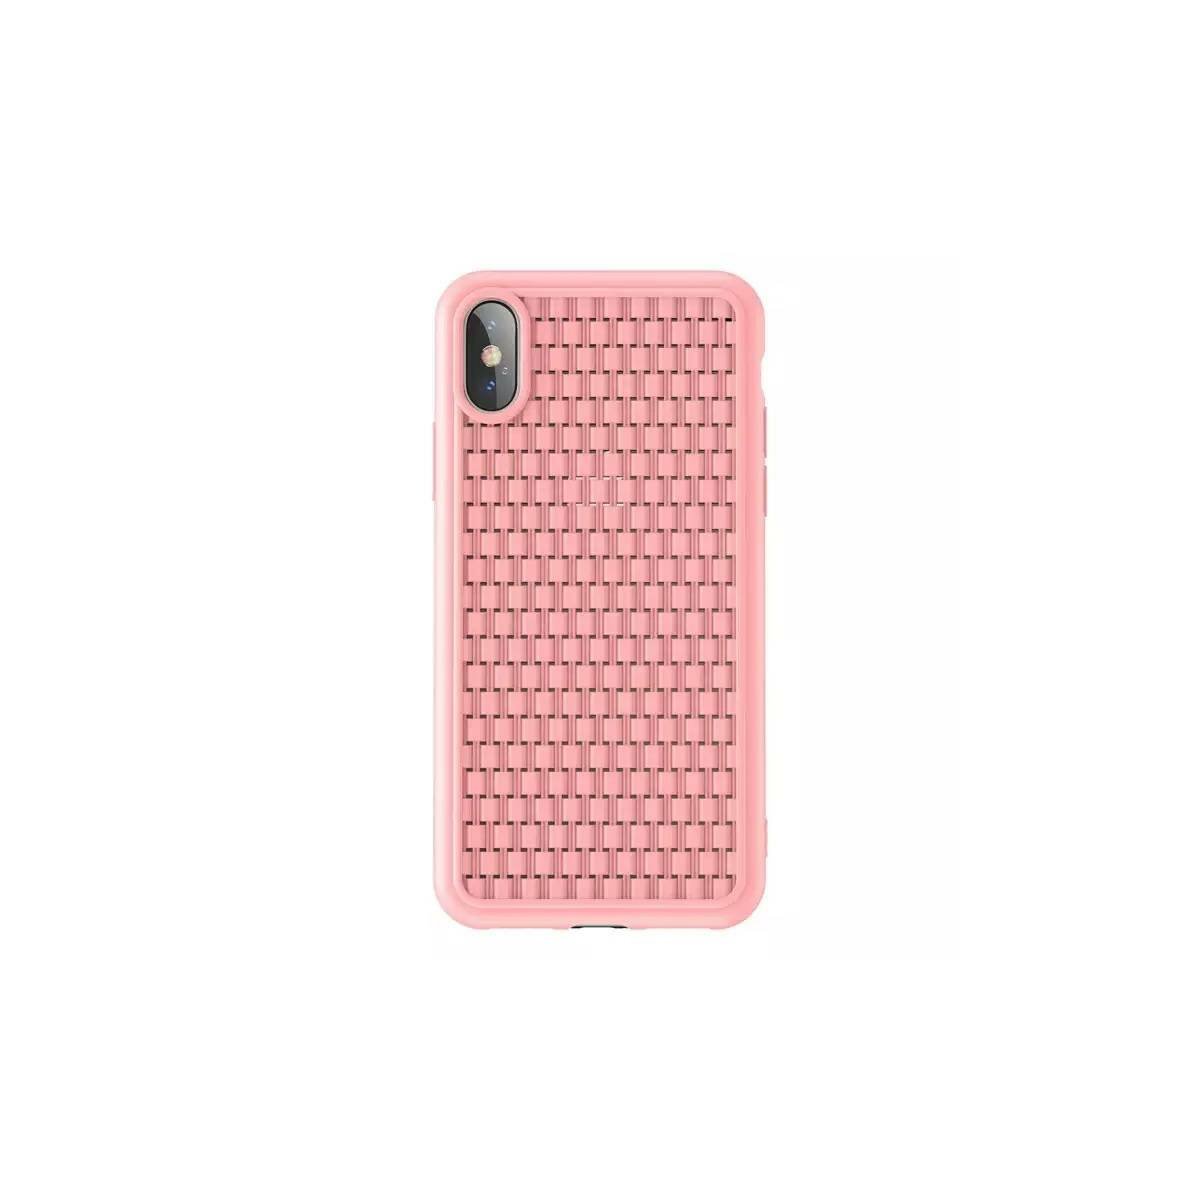 Baseus iPhone XS tok, BV, 2.generációs, rózsaszín (WIAPIPH58-BV04)